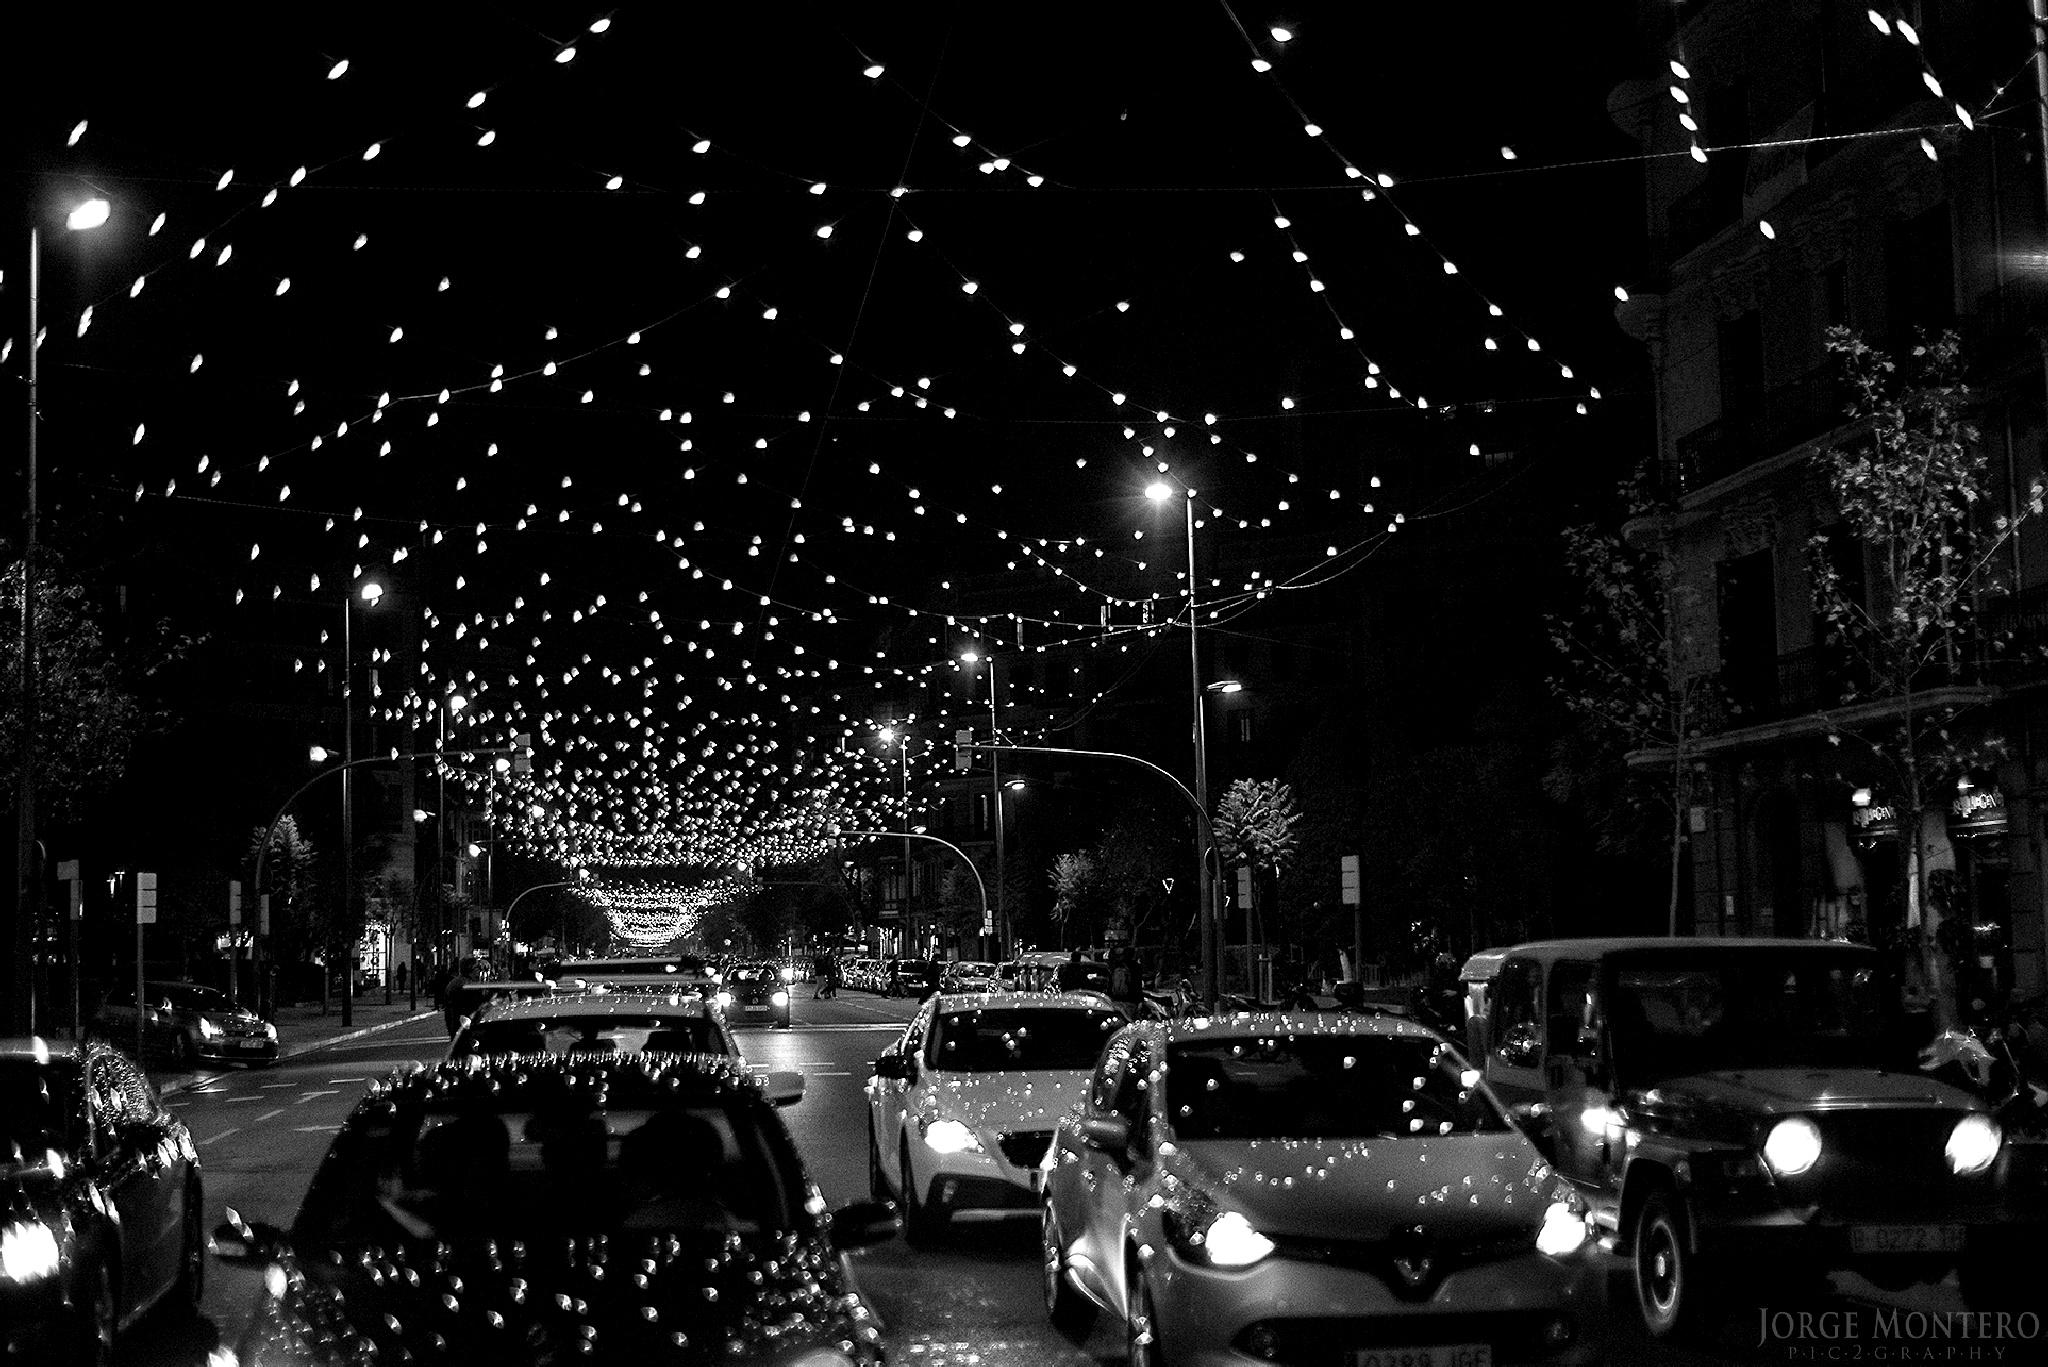 Luces de Navidad by Jorge Montero